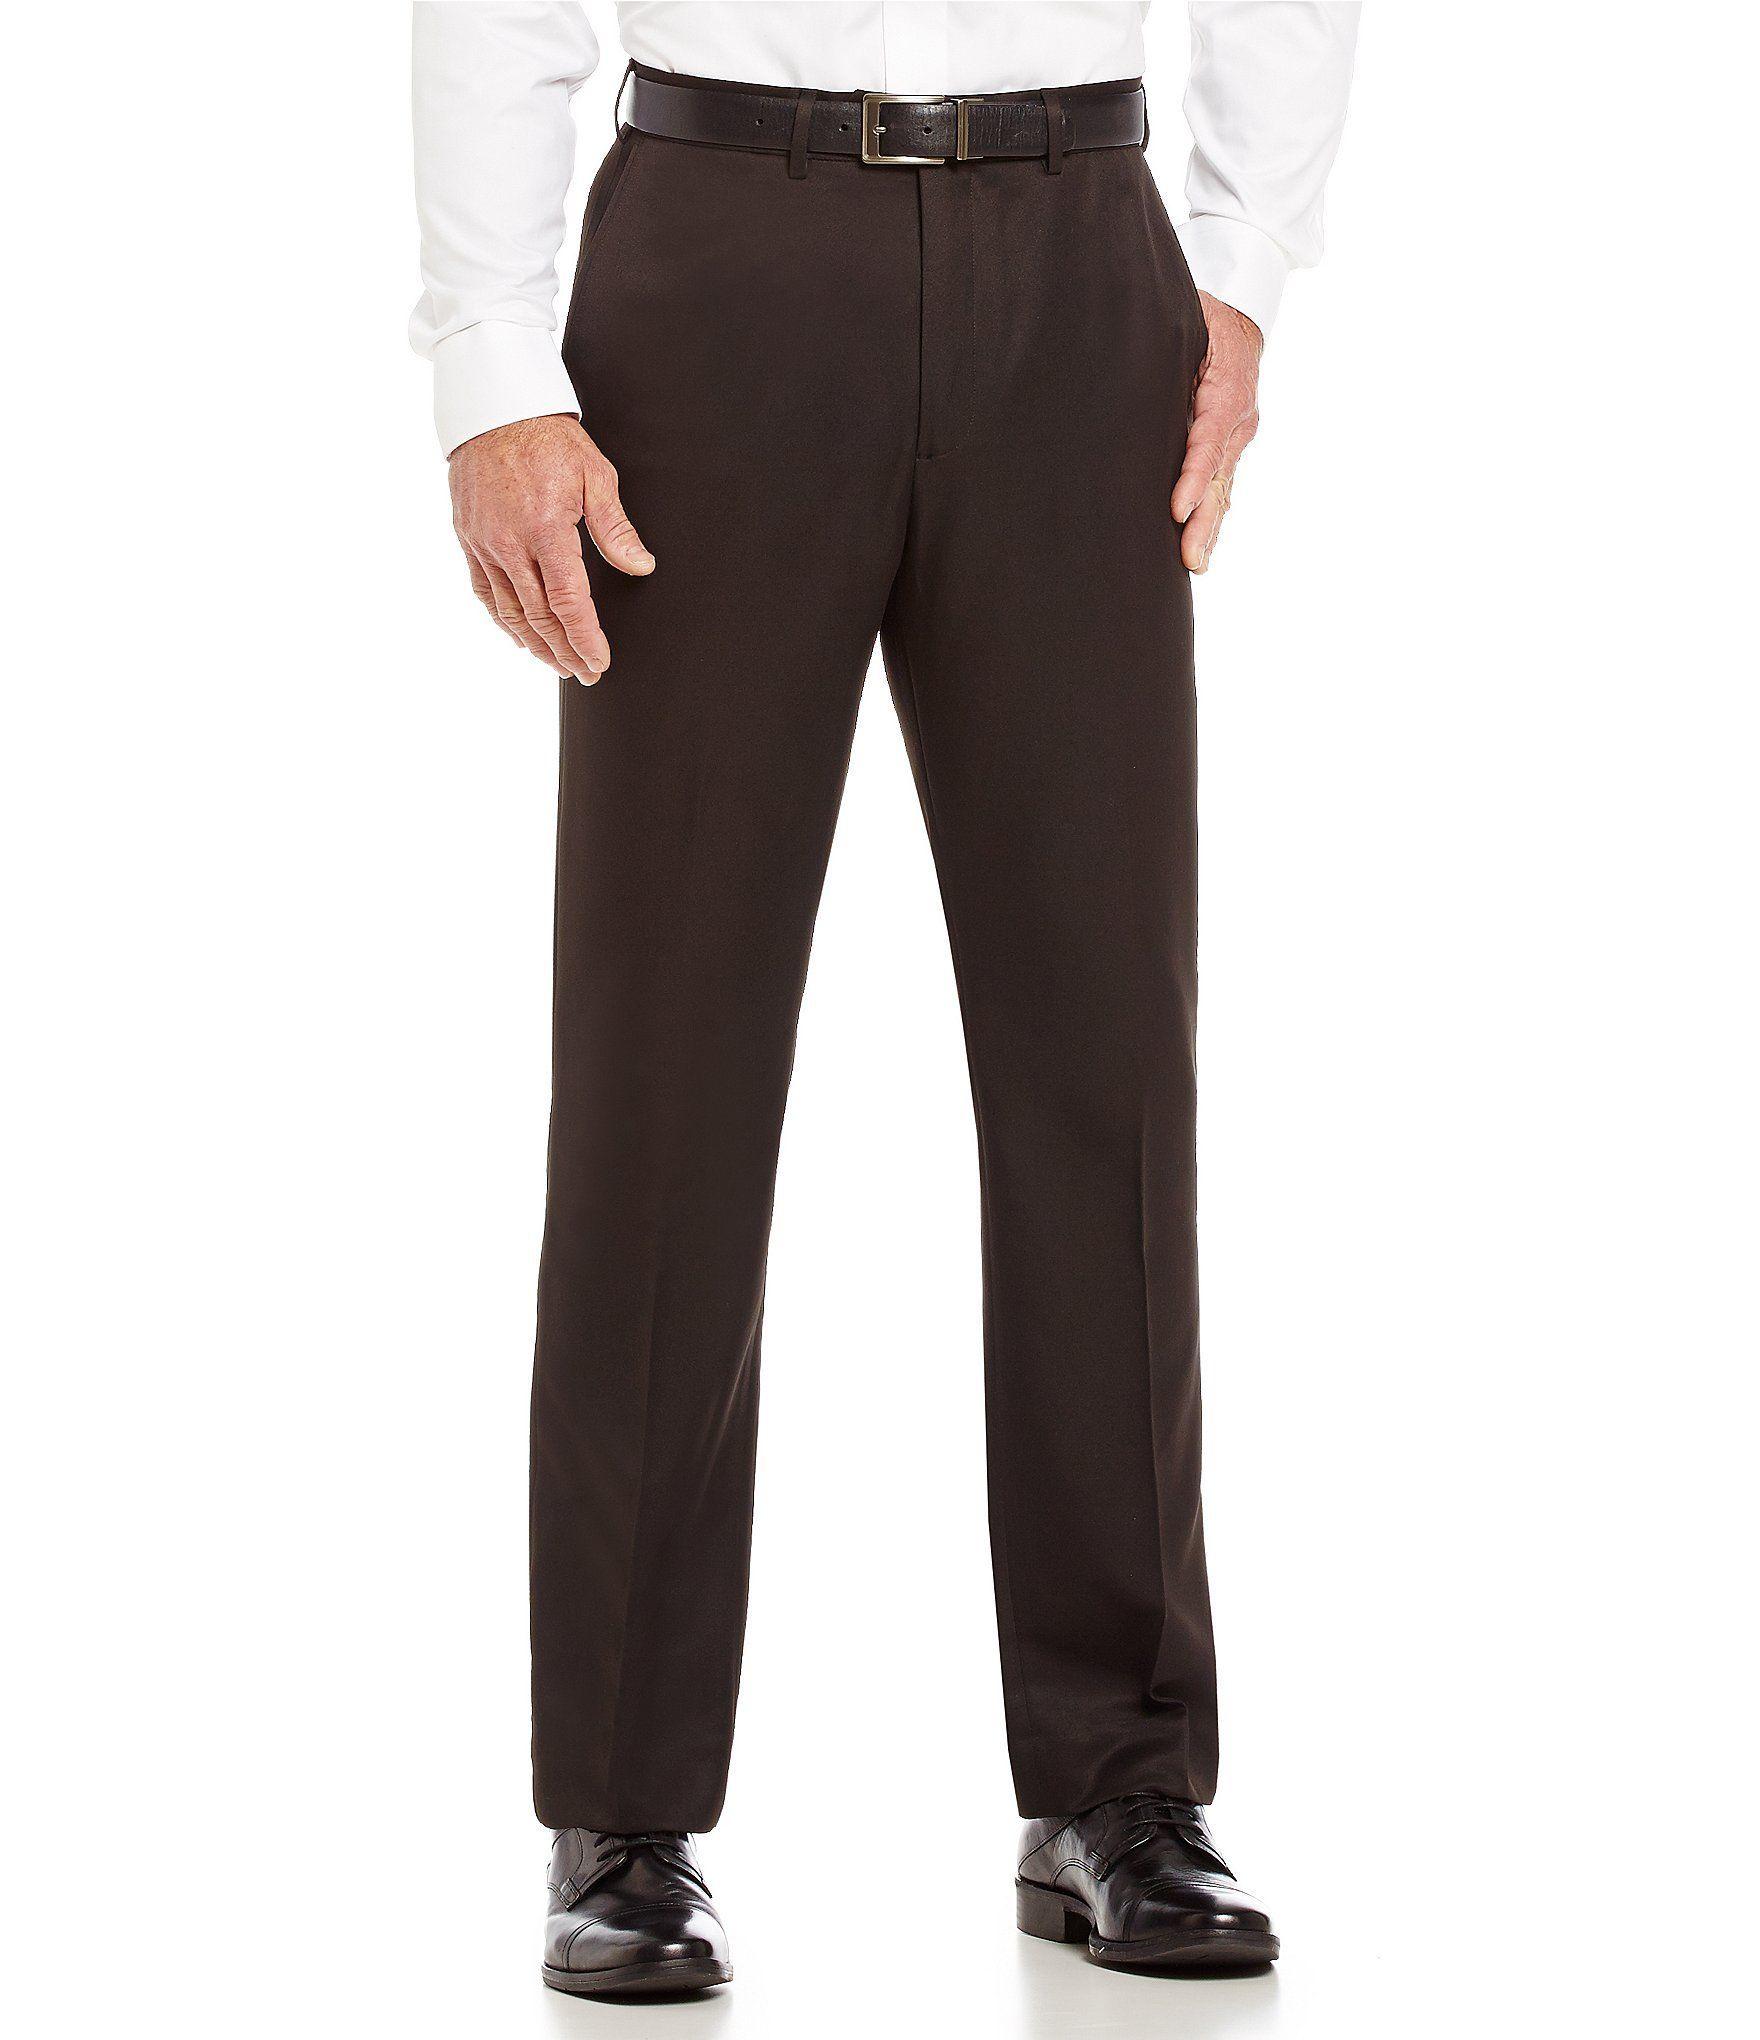 Roundtree Yorke Big Tall Classic Fit Travel Smart Flat Front Microfiber Stretch Dress Pants Black 50 2 Evening Dress Pants Microfiber Dress Pants For Women [ 2040 x 1760 Pixel ]